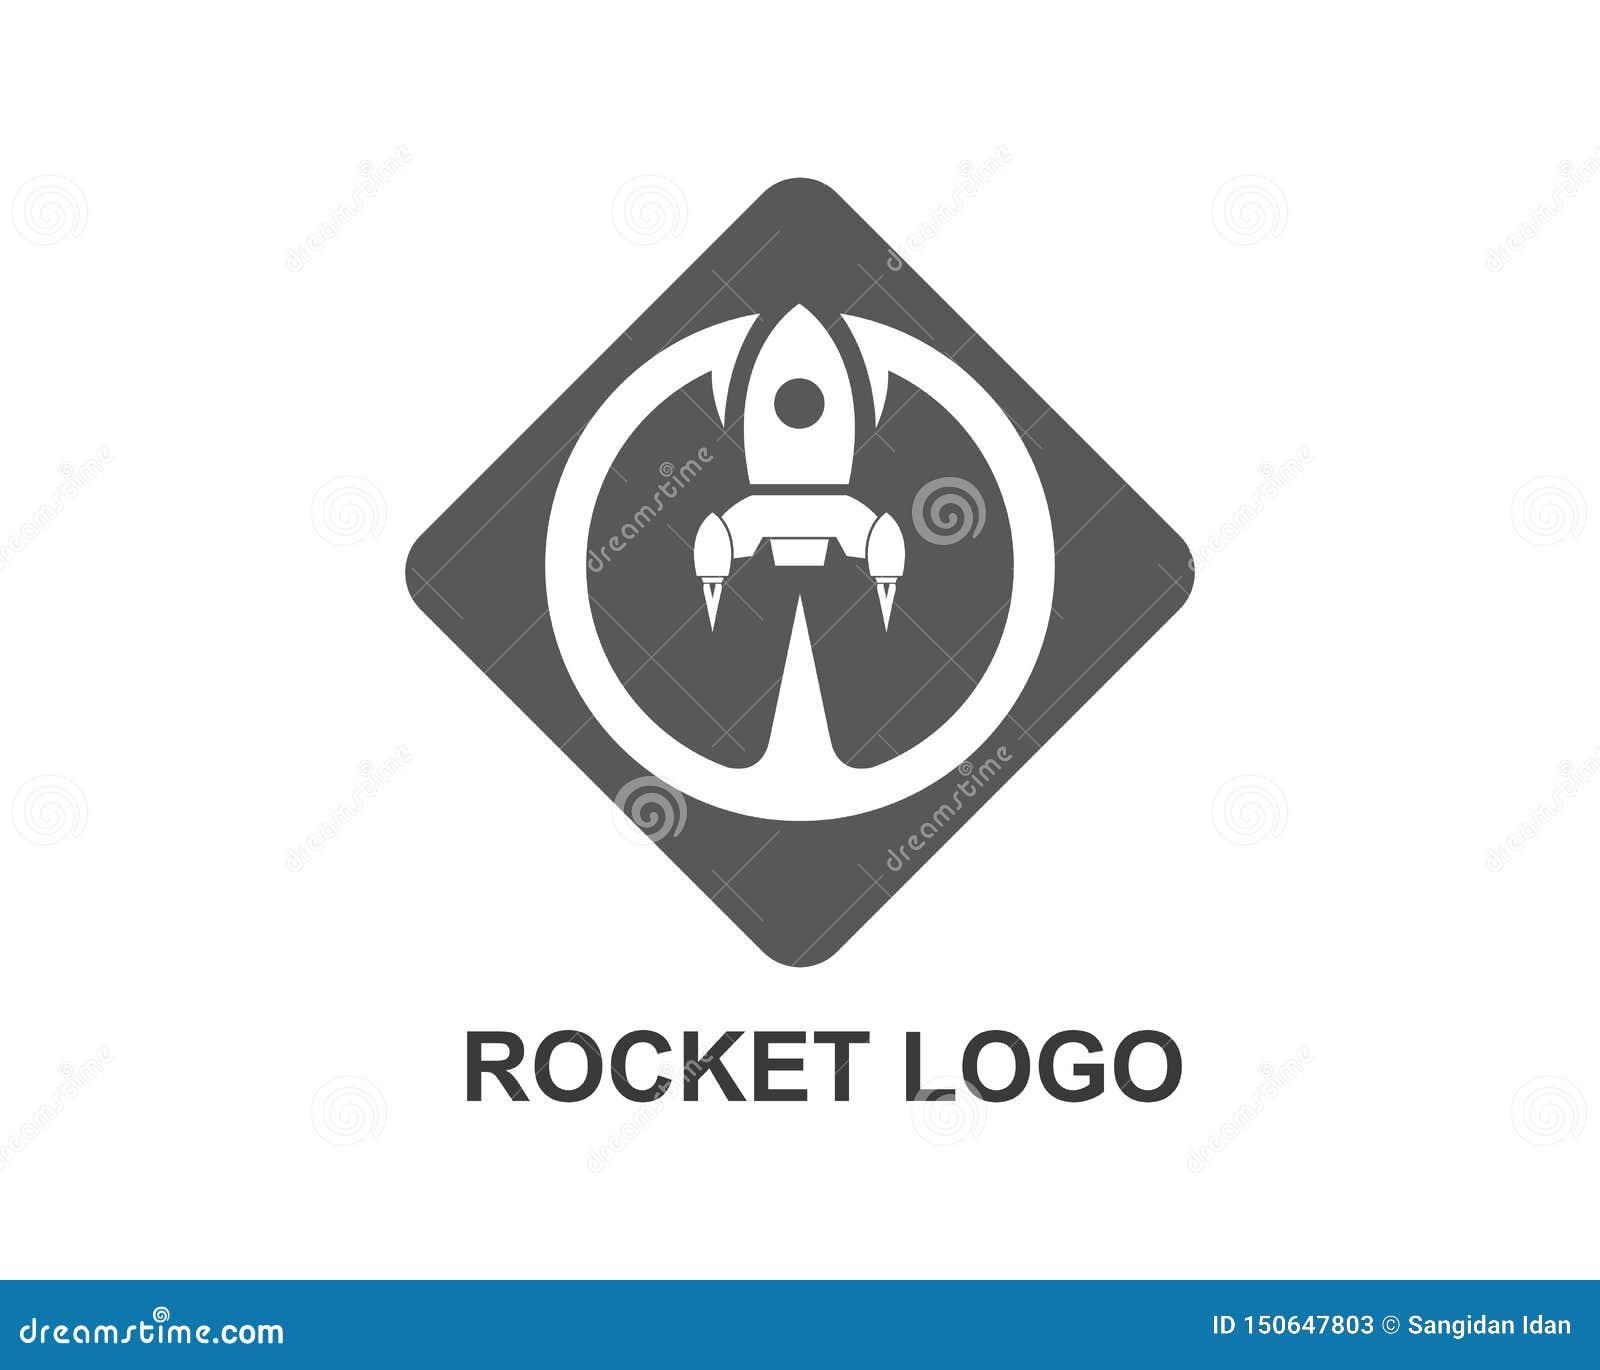 Rocket ilustration logo vector icon